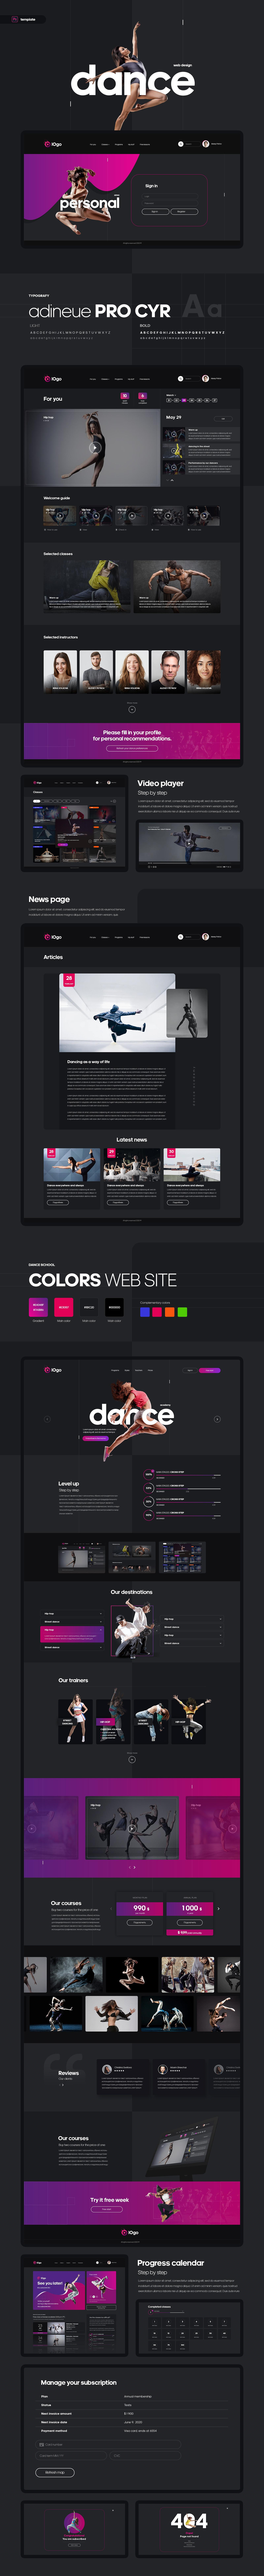 Dance, Fitness Studio Template